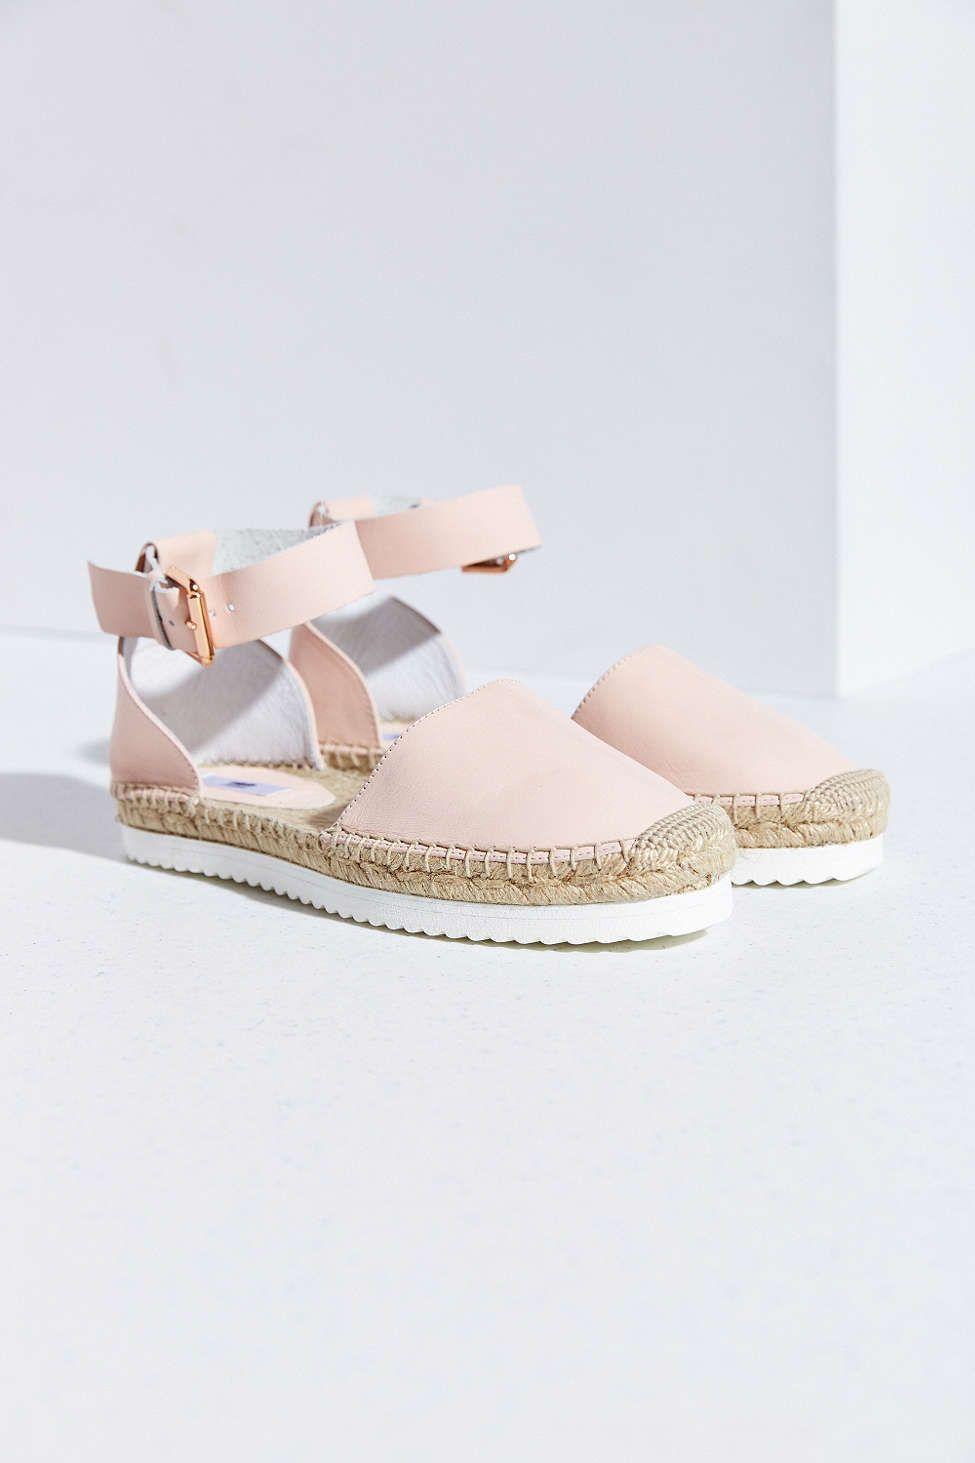 Miista Cassandra Espadrille Sandal - Urban Outfitters